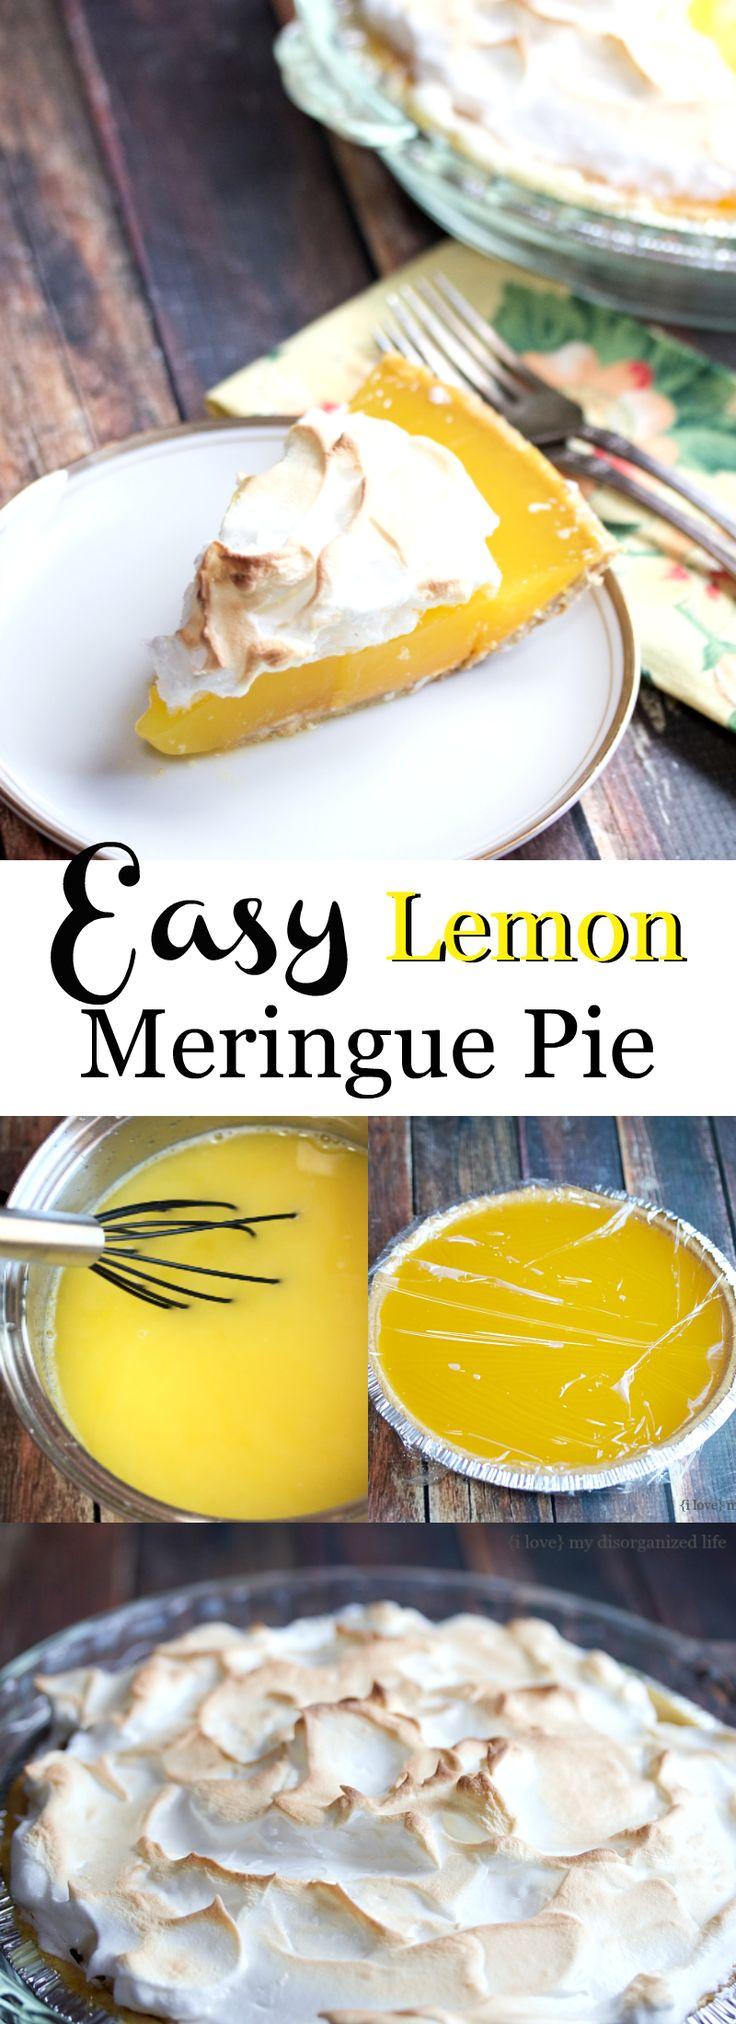 25 best ideas about crisco pie crust recipe on pinterest for Lemon meringue pie with graham cracker crust